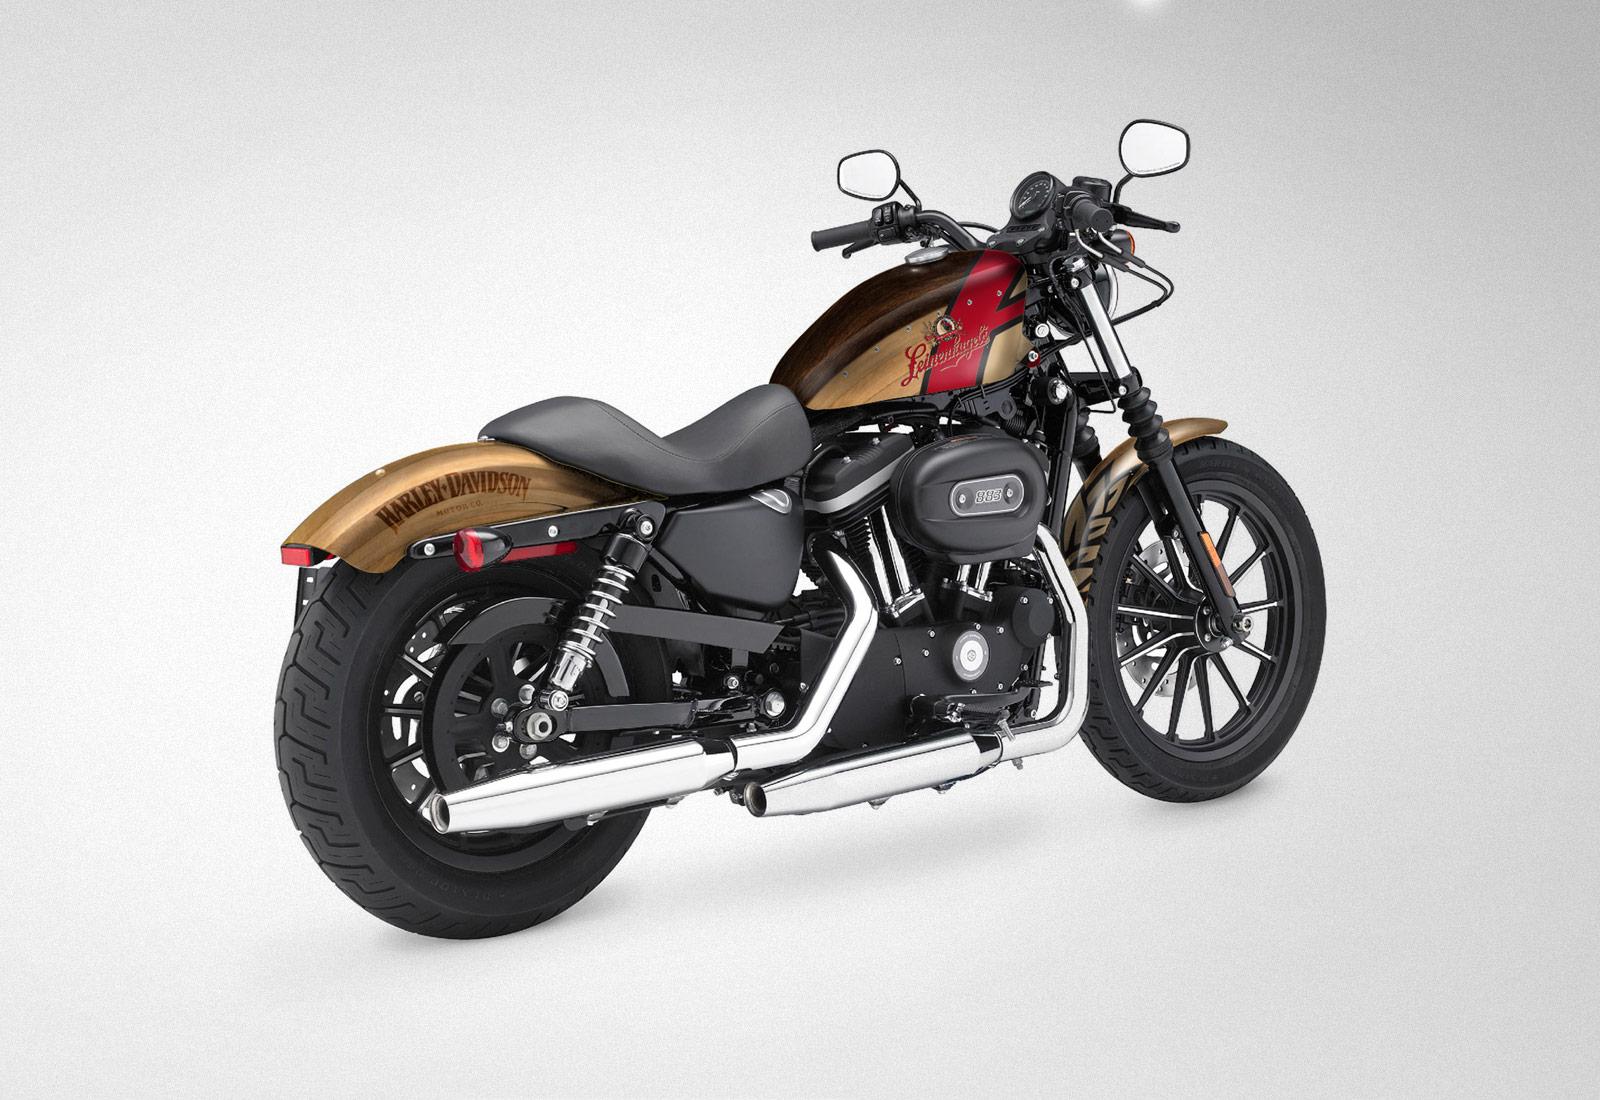 Harley Davidson 883 Leinenkugel